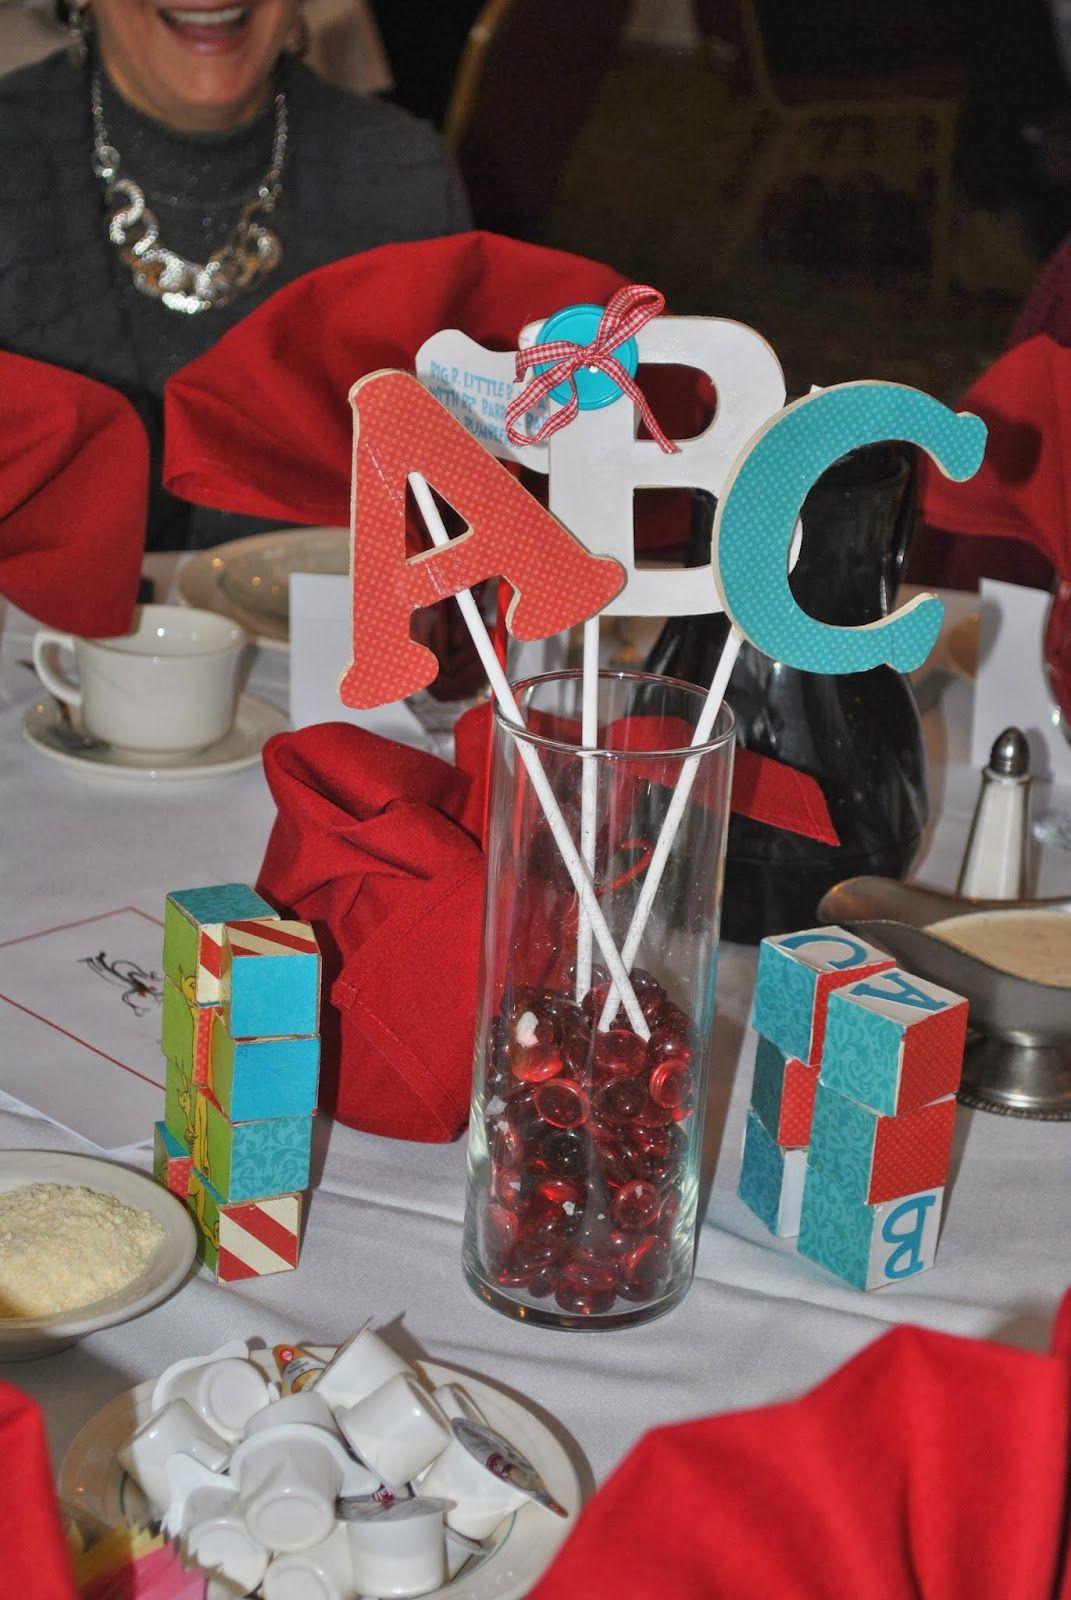 Dr. Seuss ABC Book baby shower centerpiece | Dr. Seuss Baby shower ...